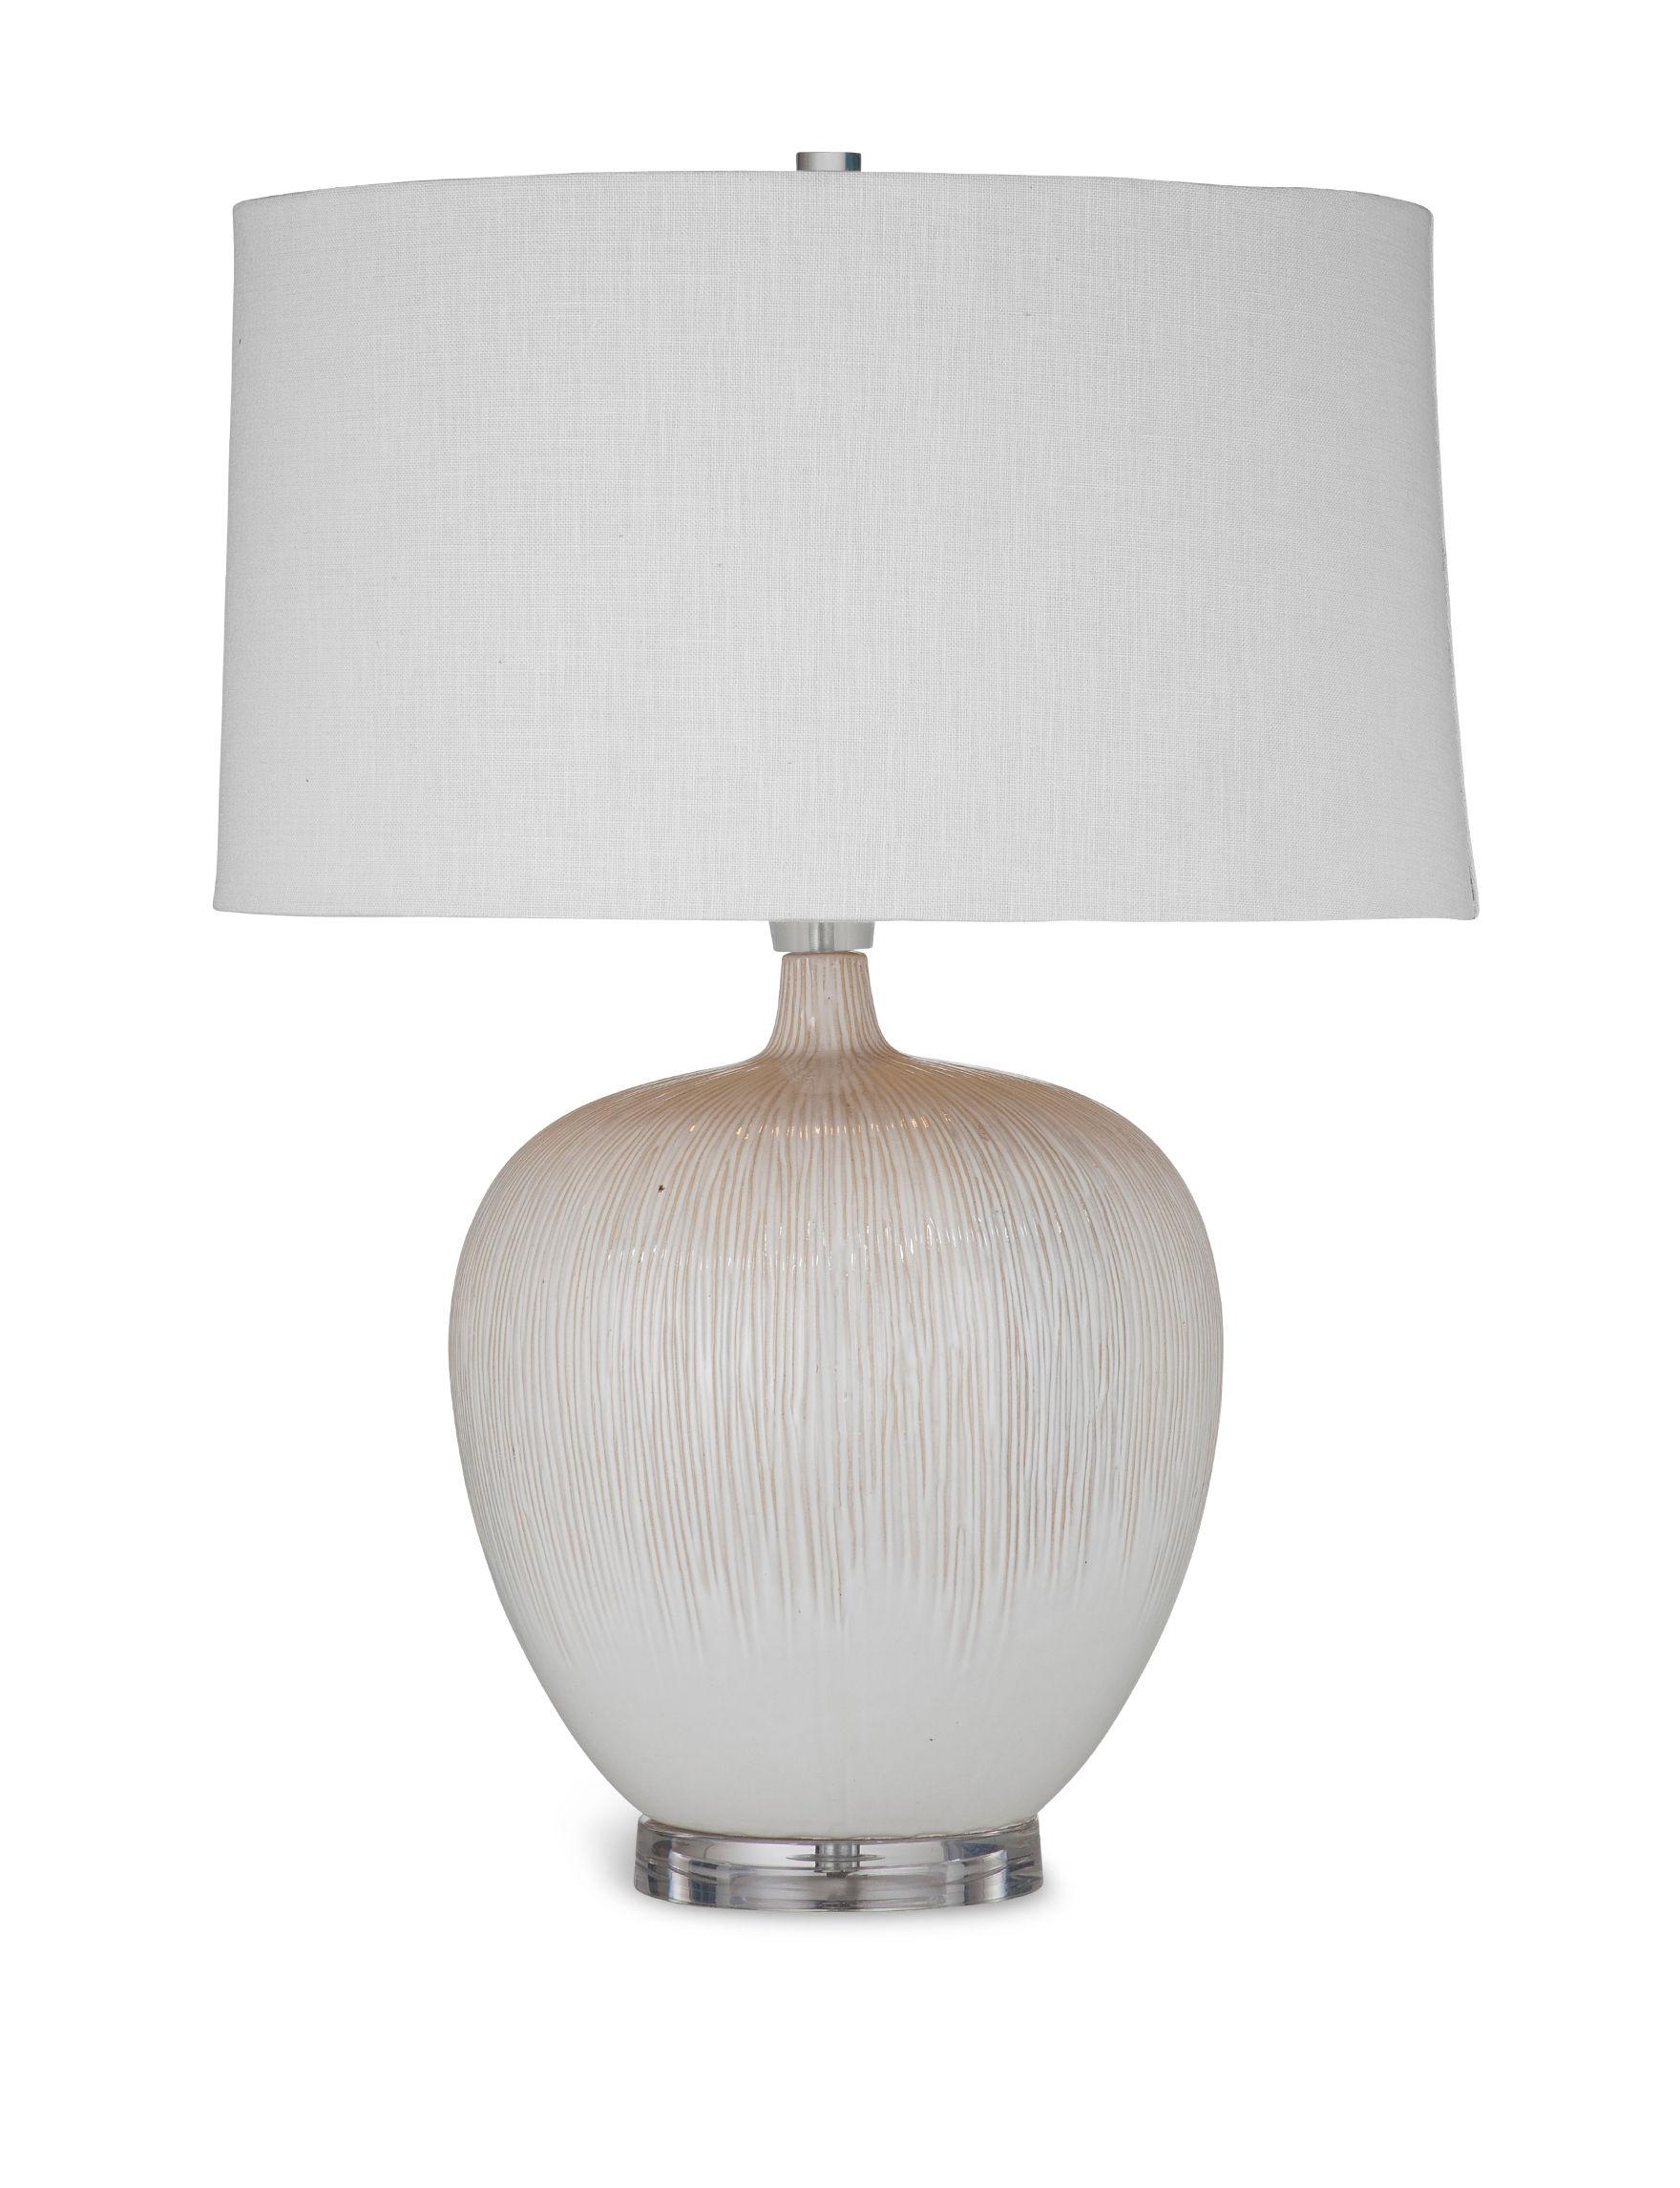 Bassett Mirror Co. Beige Table Lamps Lighting & Lamps